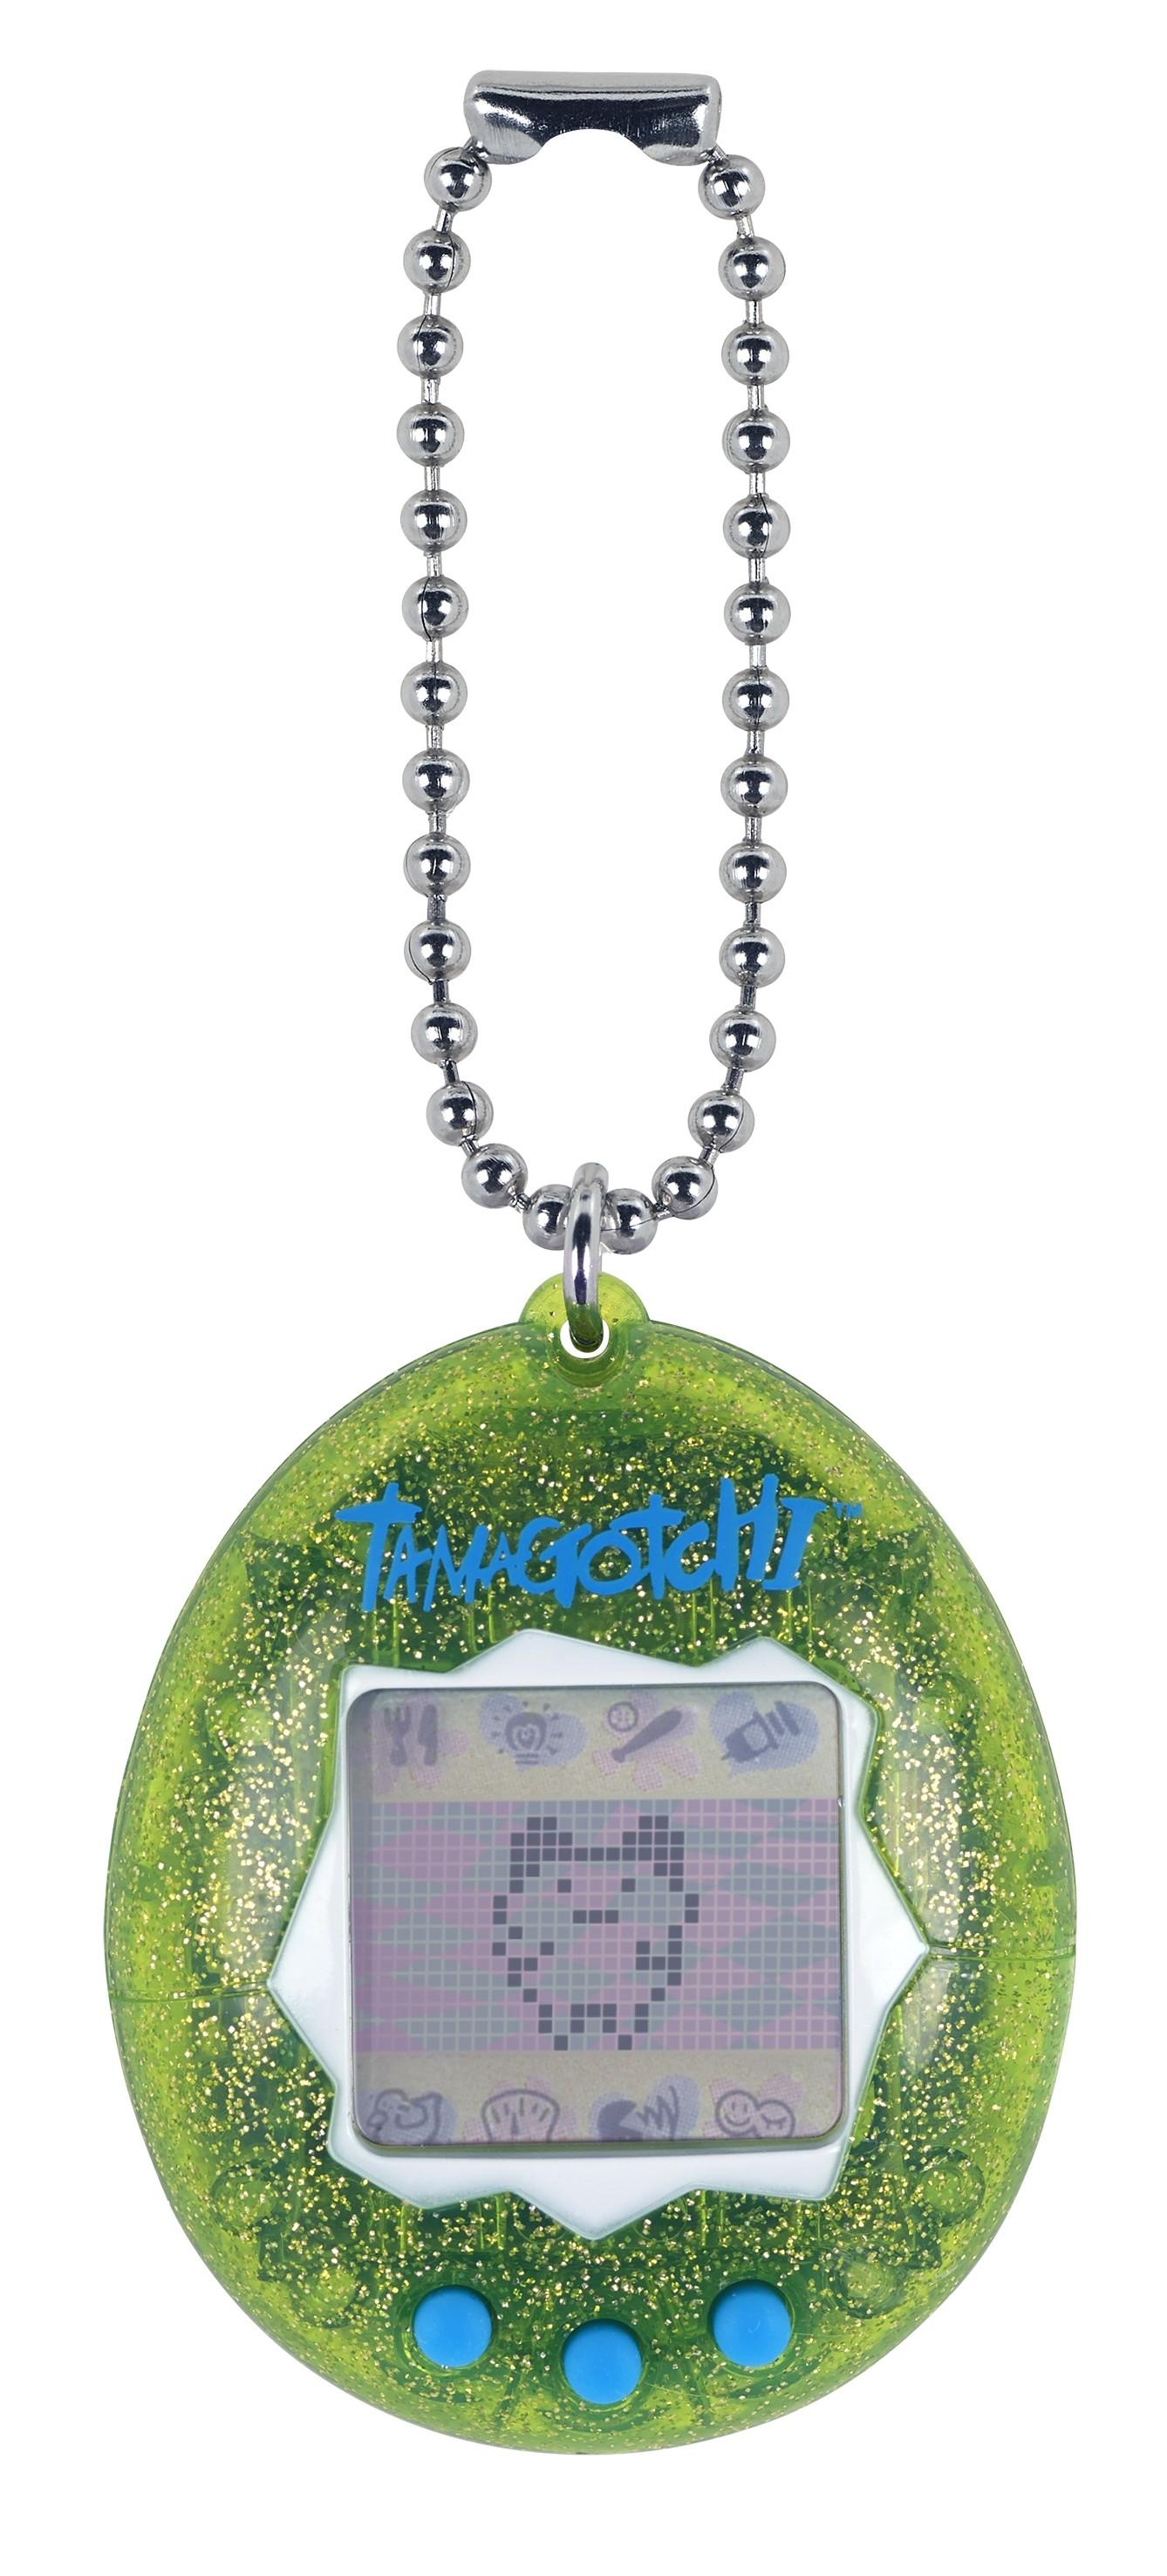 Tamagotchi 2019 Limited Edition Original Green Glitter